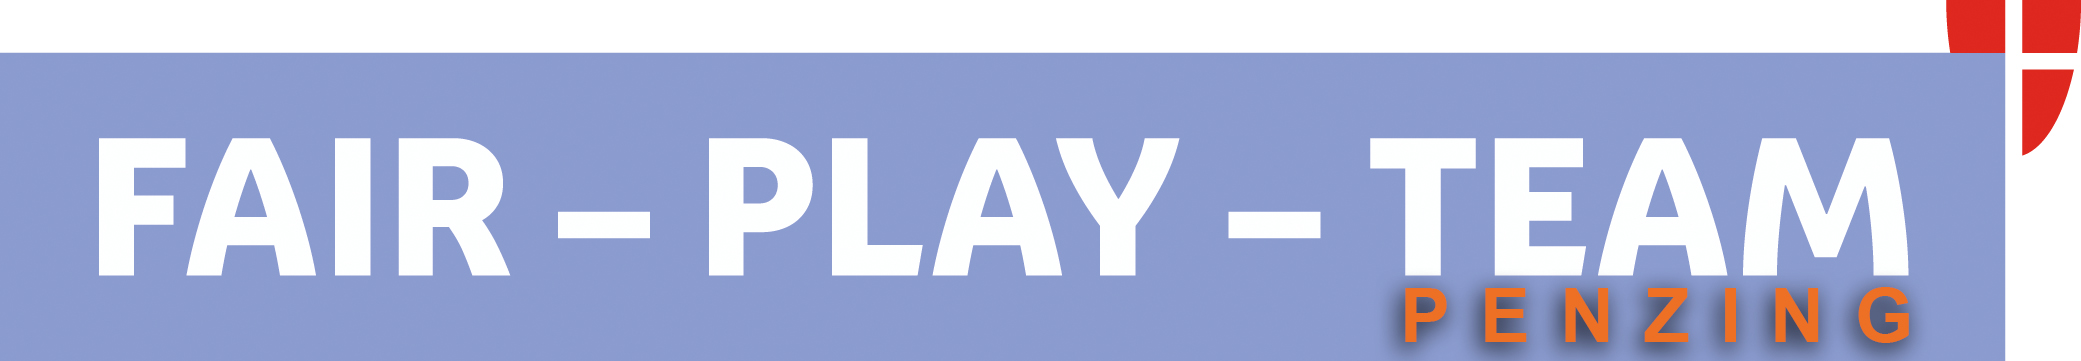 FairPlayTeam-Penzing